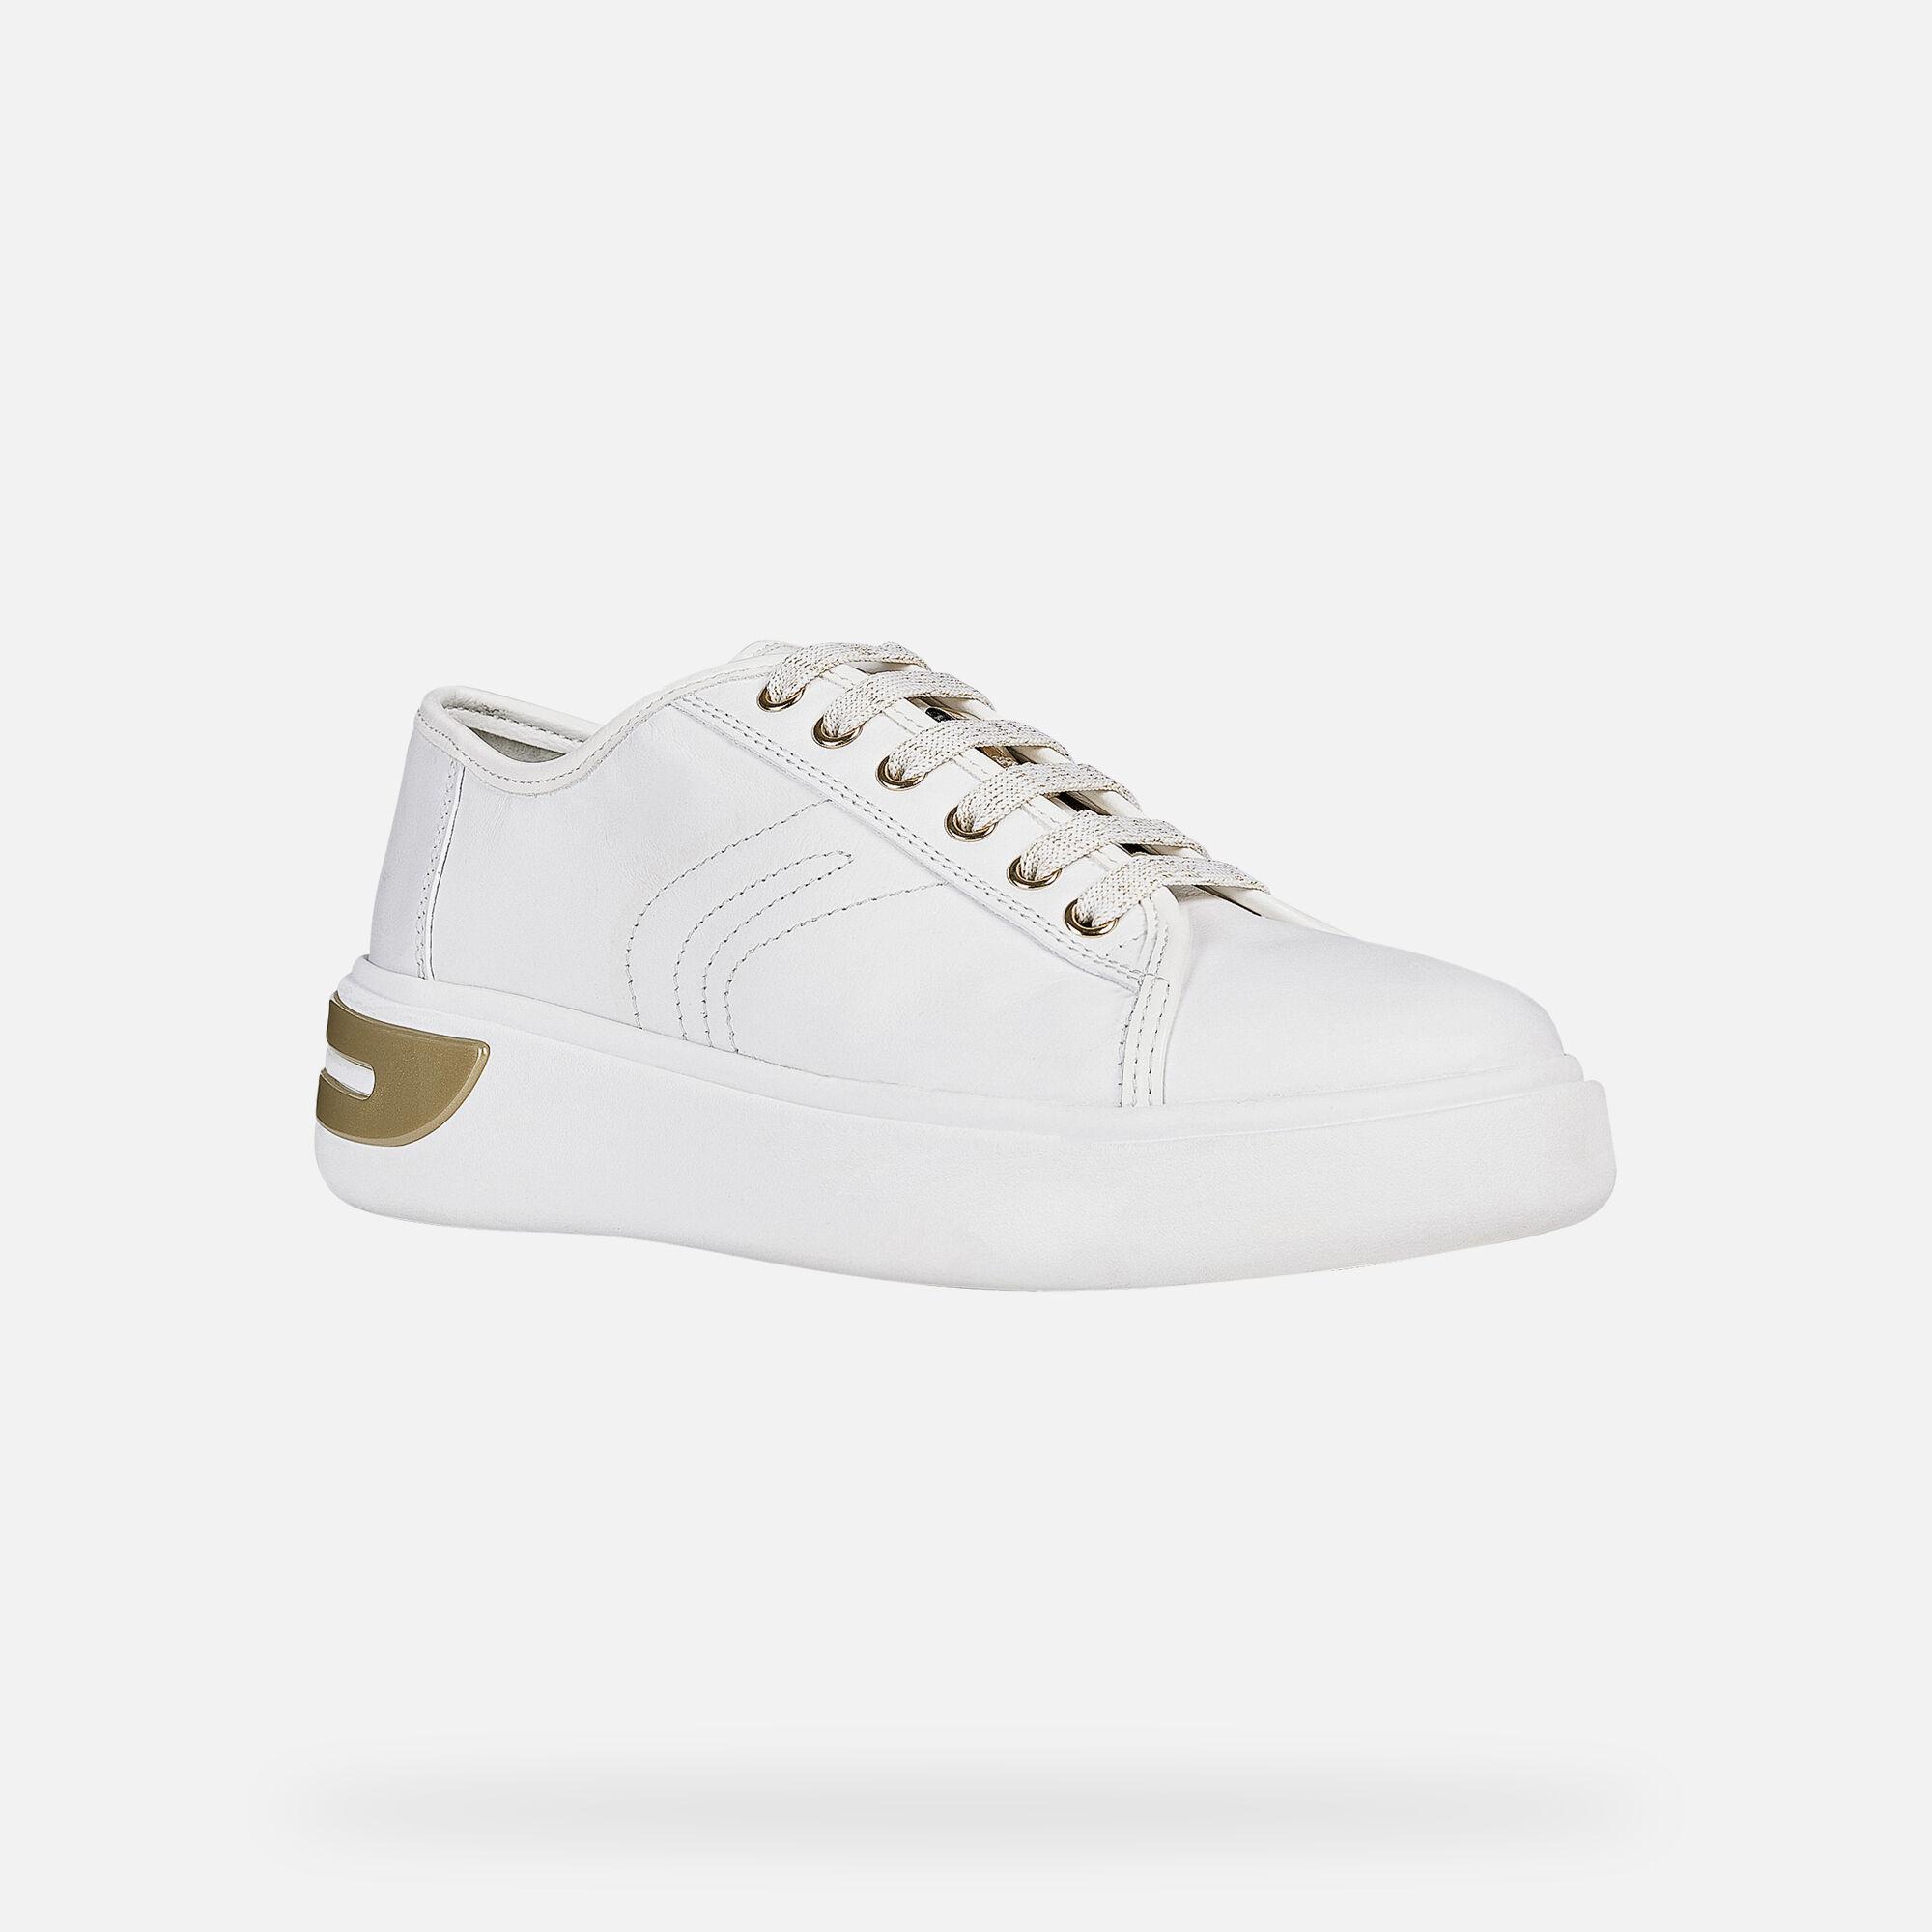 Geox OTTAYA Woman: White Sneakers